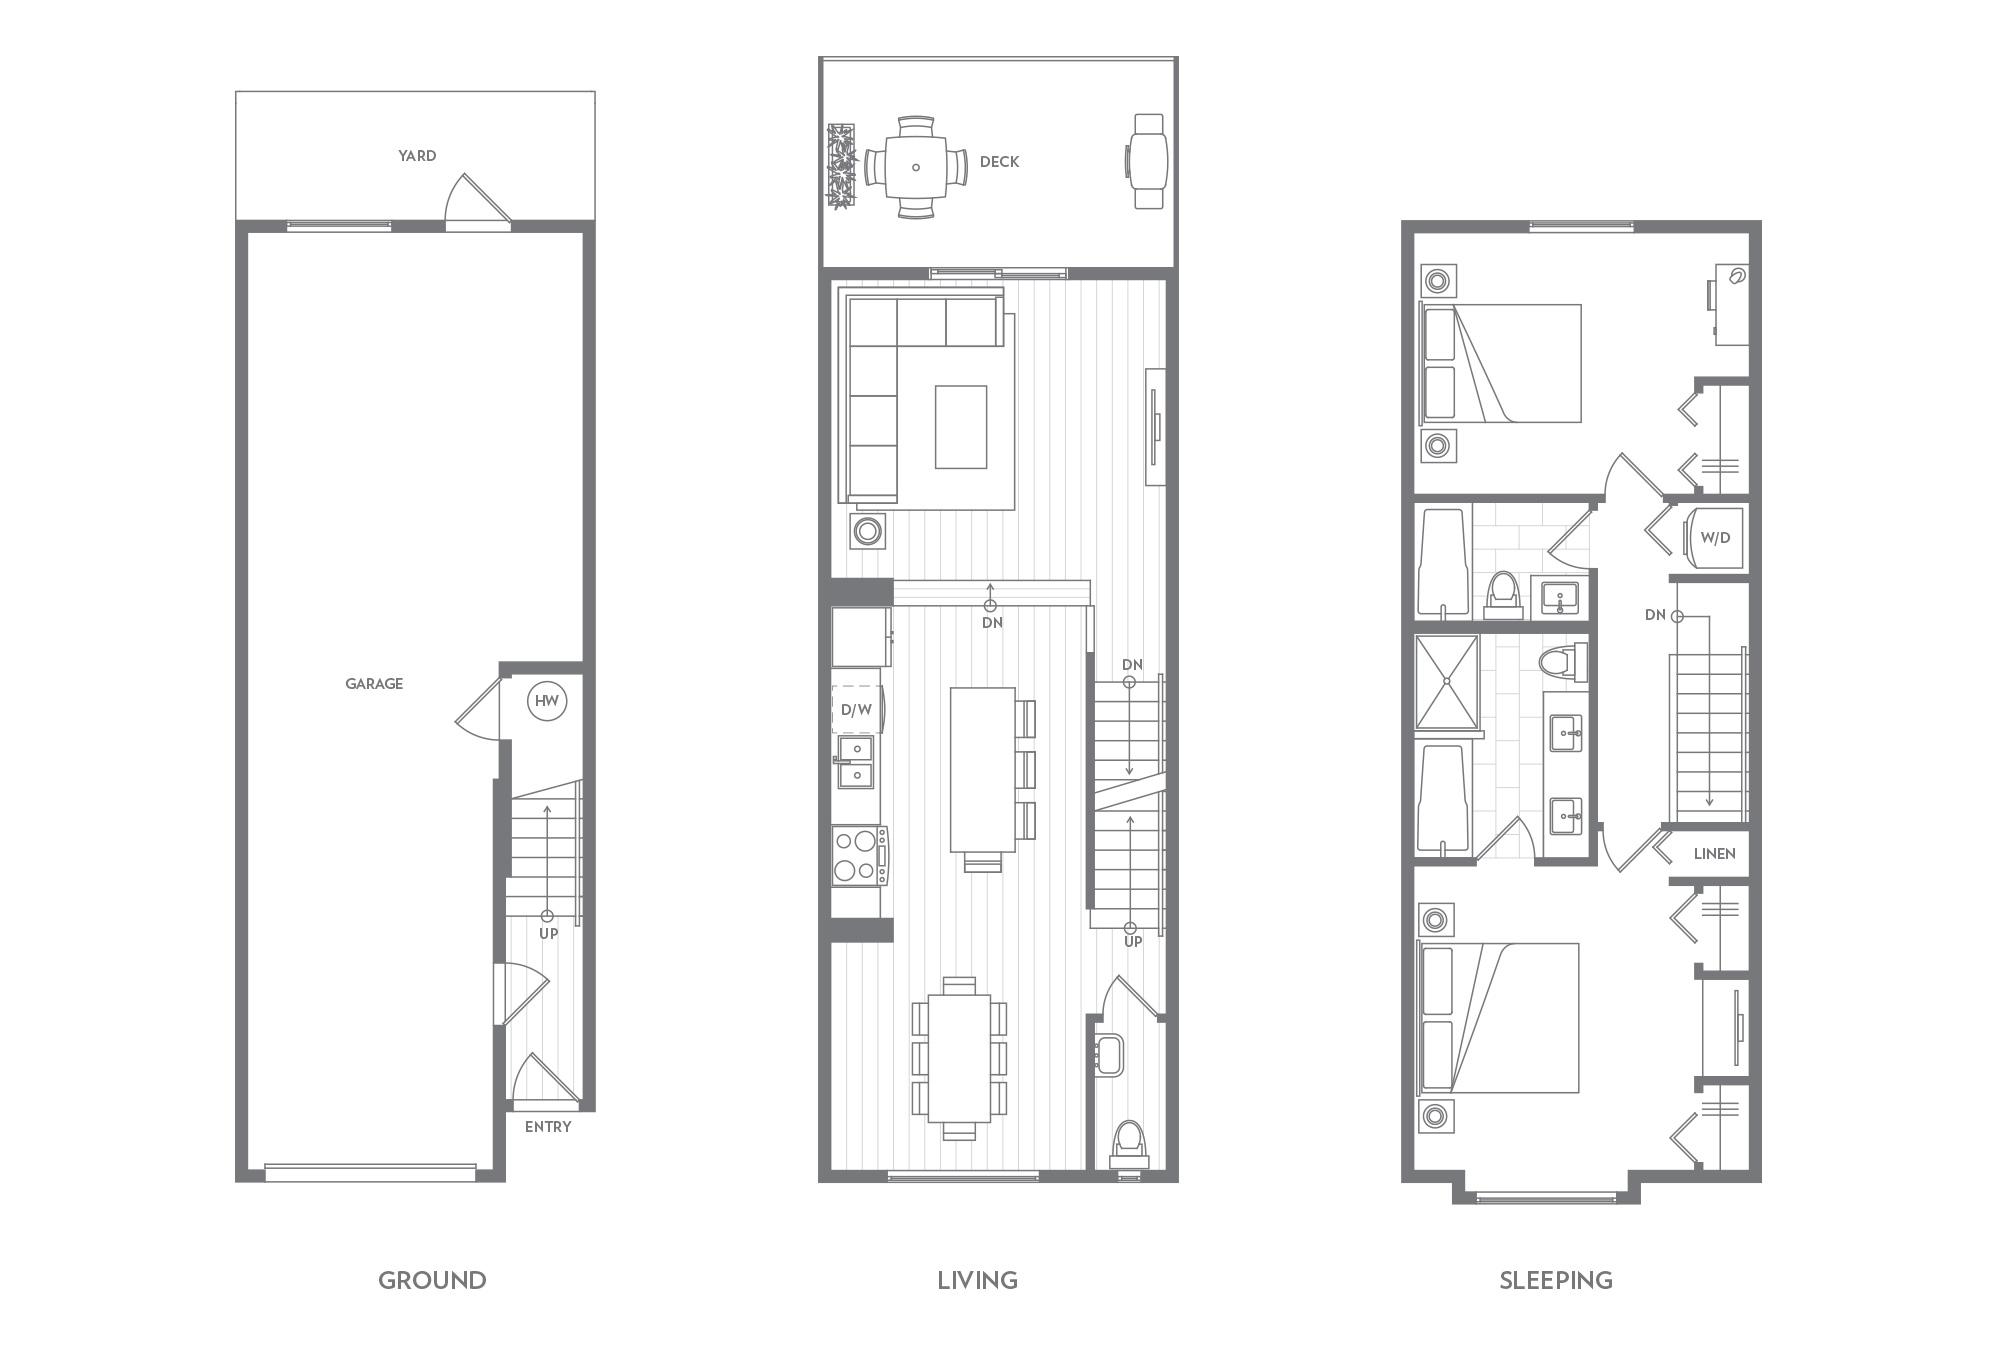 Anytime Fitness Floor Plan | gym floor plan layout joy